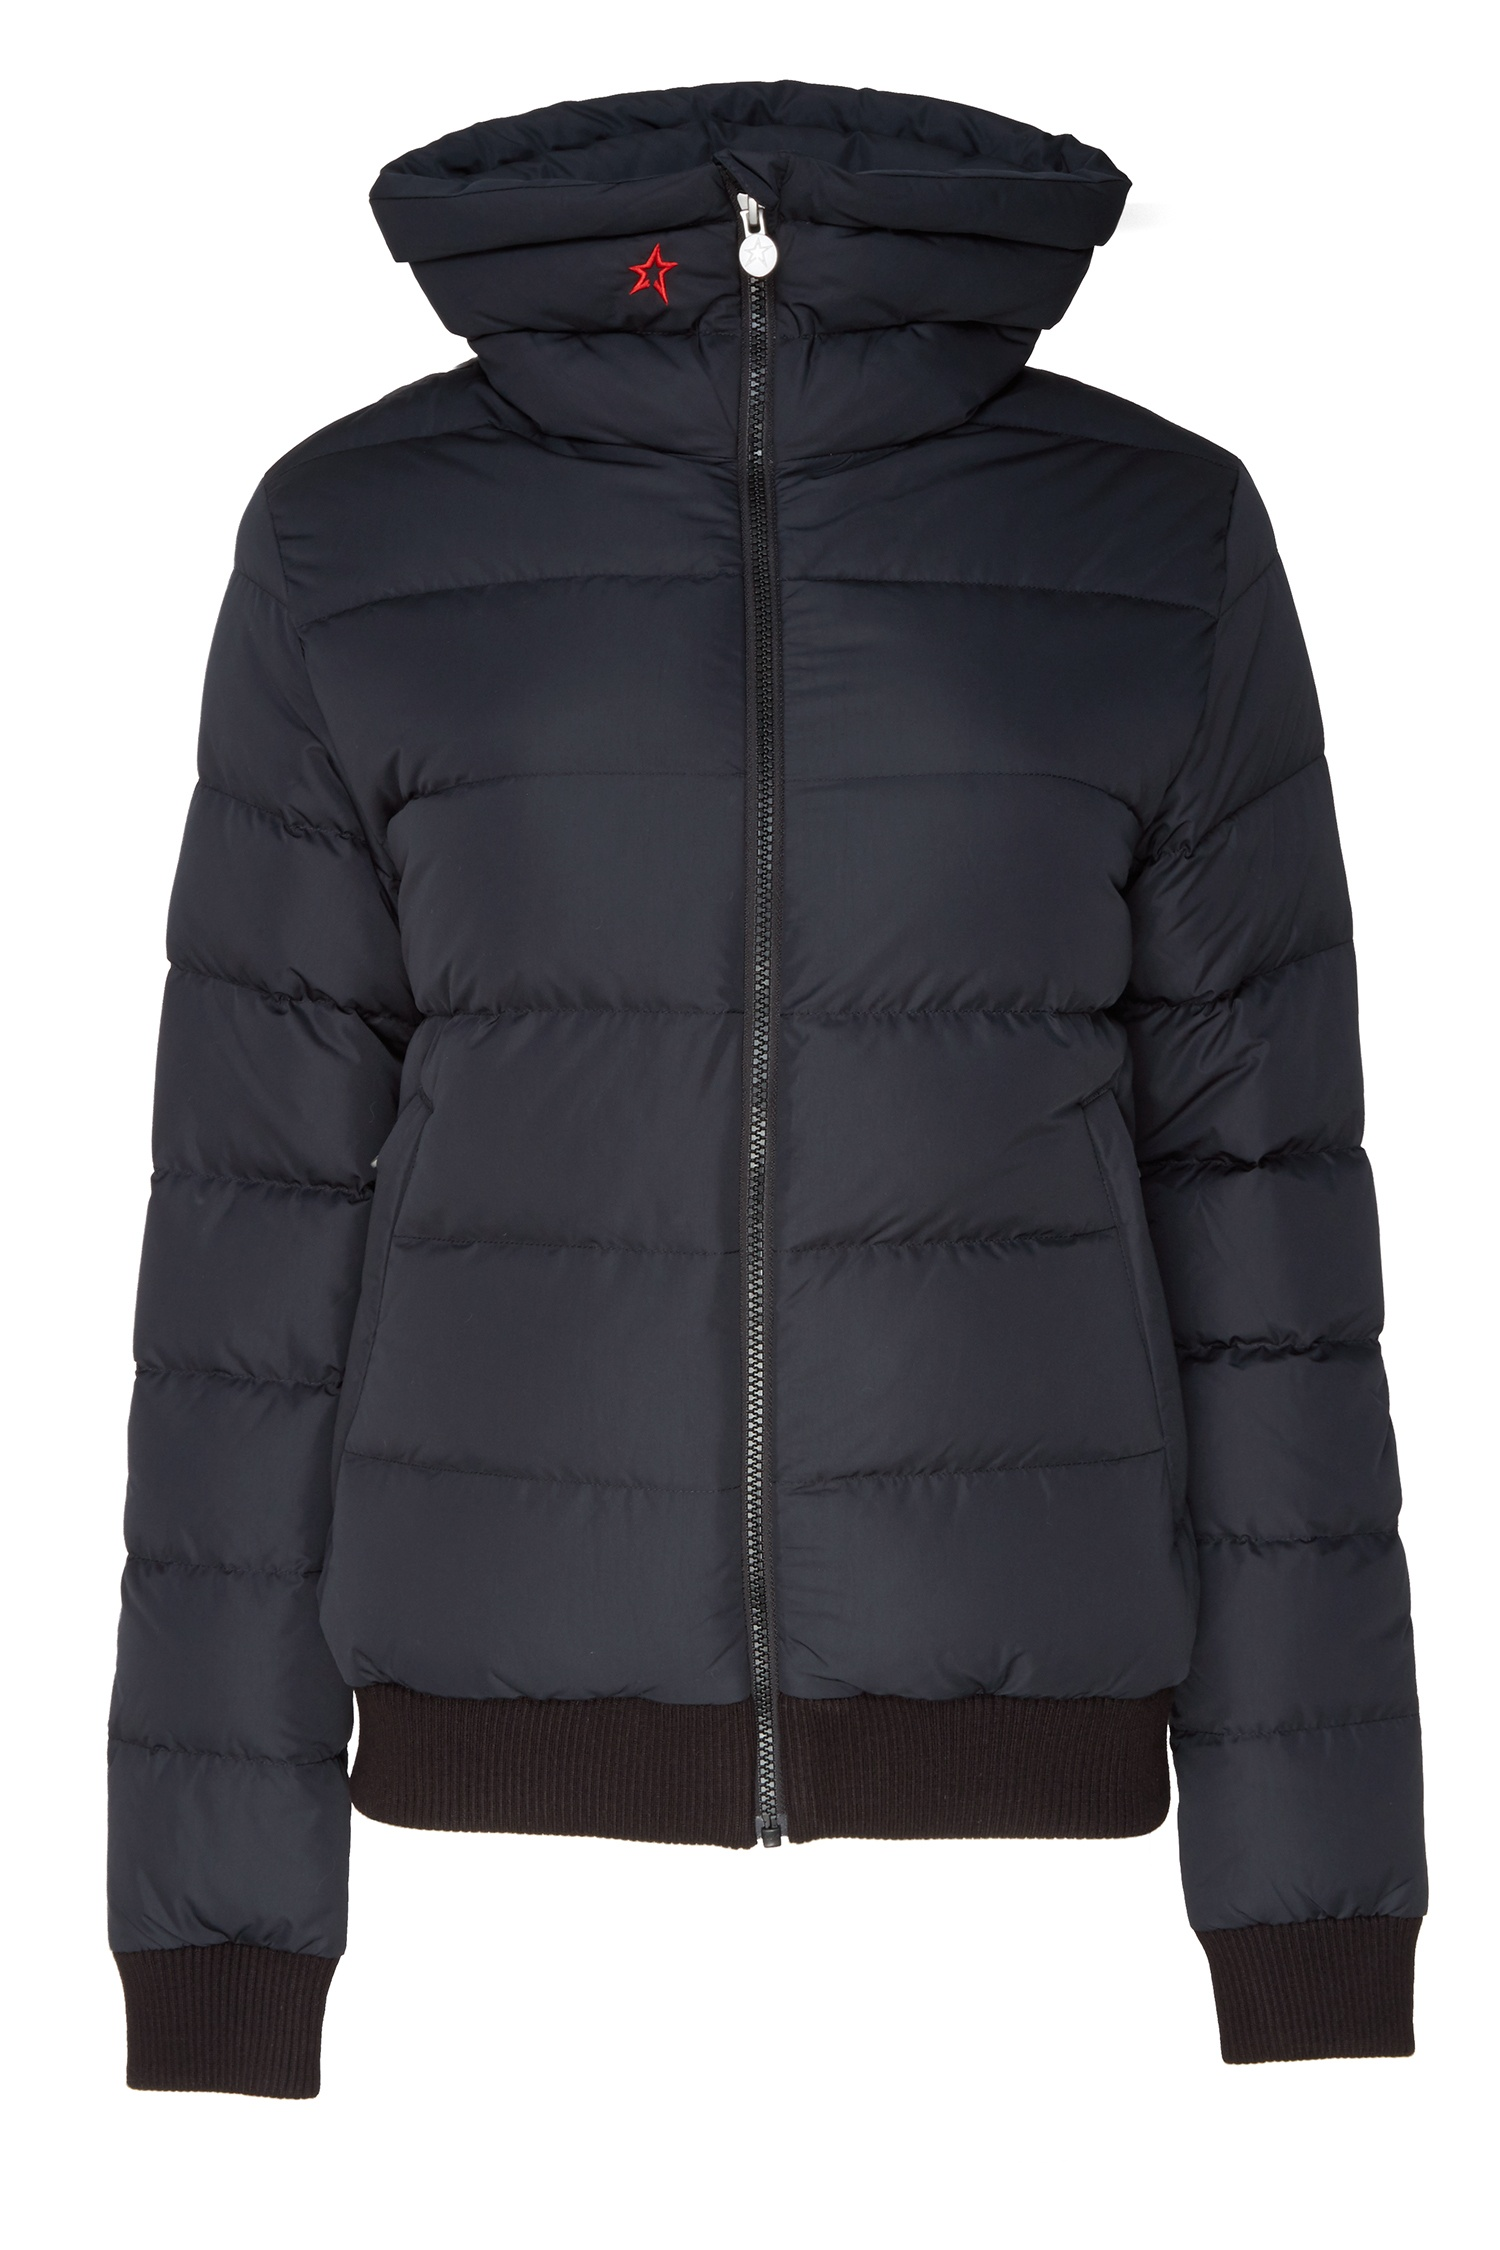 2b01632d5034 Черная горнолыжная куртка на пуху Super Star Perfect Moment – купить ...